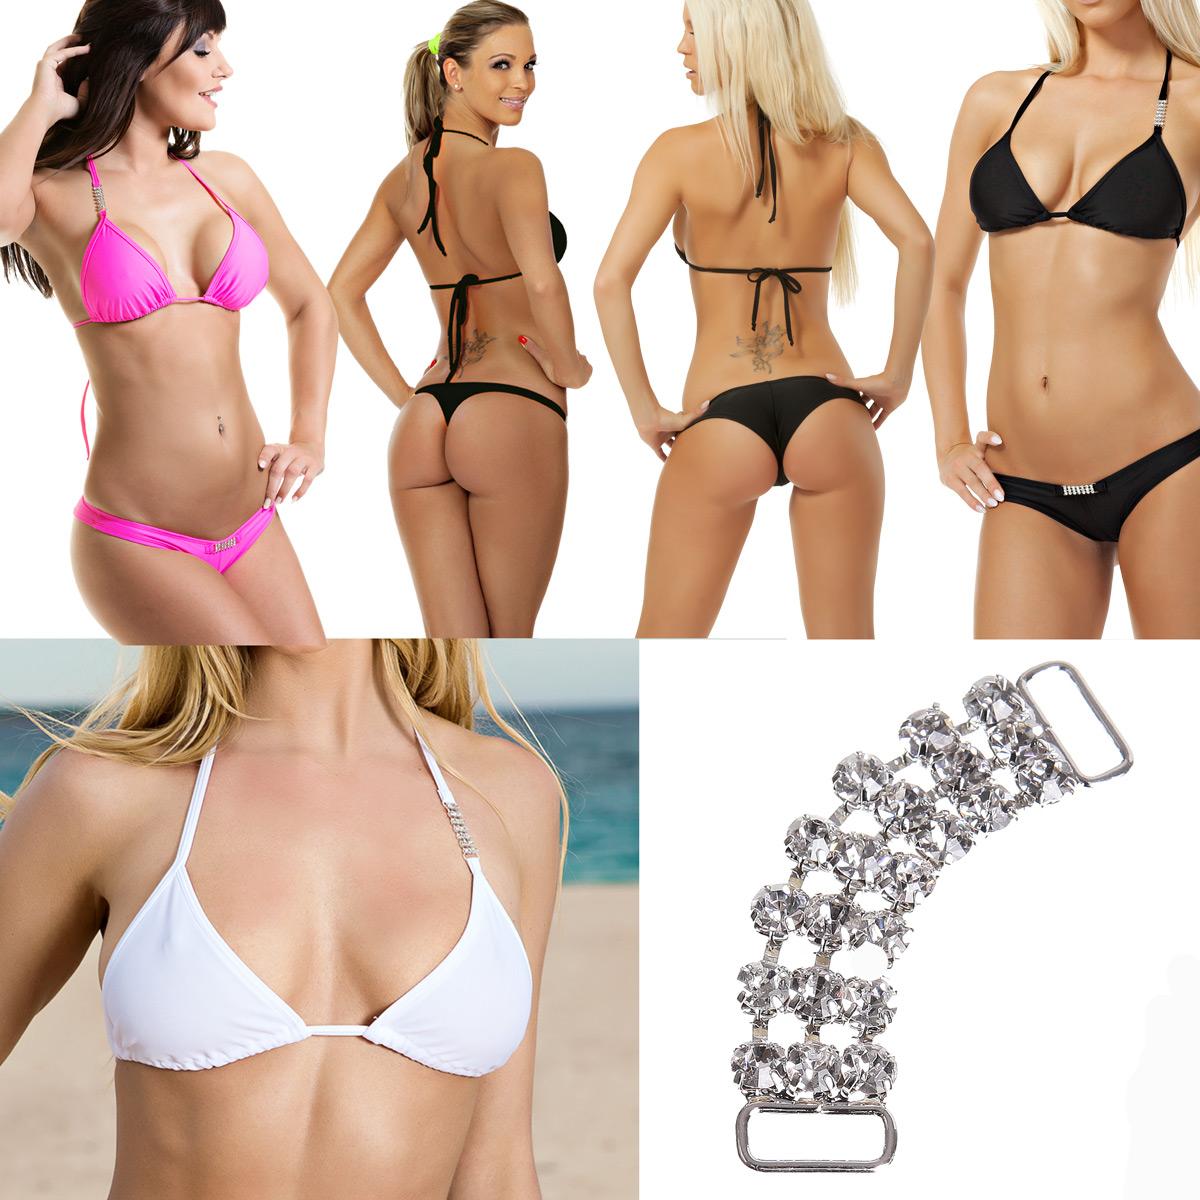 sexy bikini mit strass schwarz weiss pink xs s m l. Black Bedroom Furniture Sets. Home Design Ideas